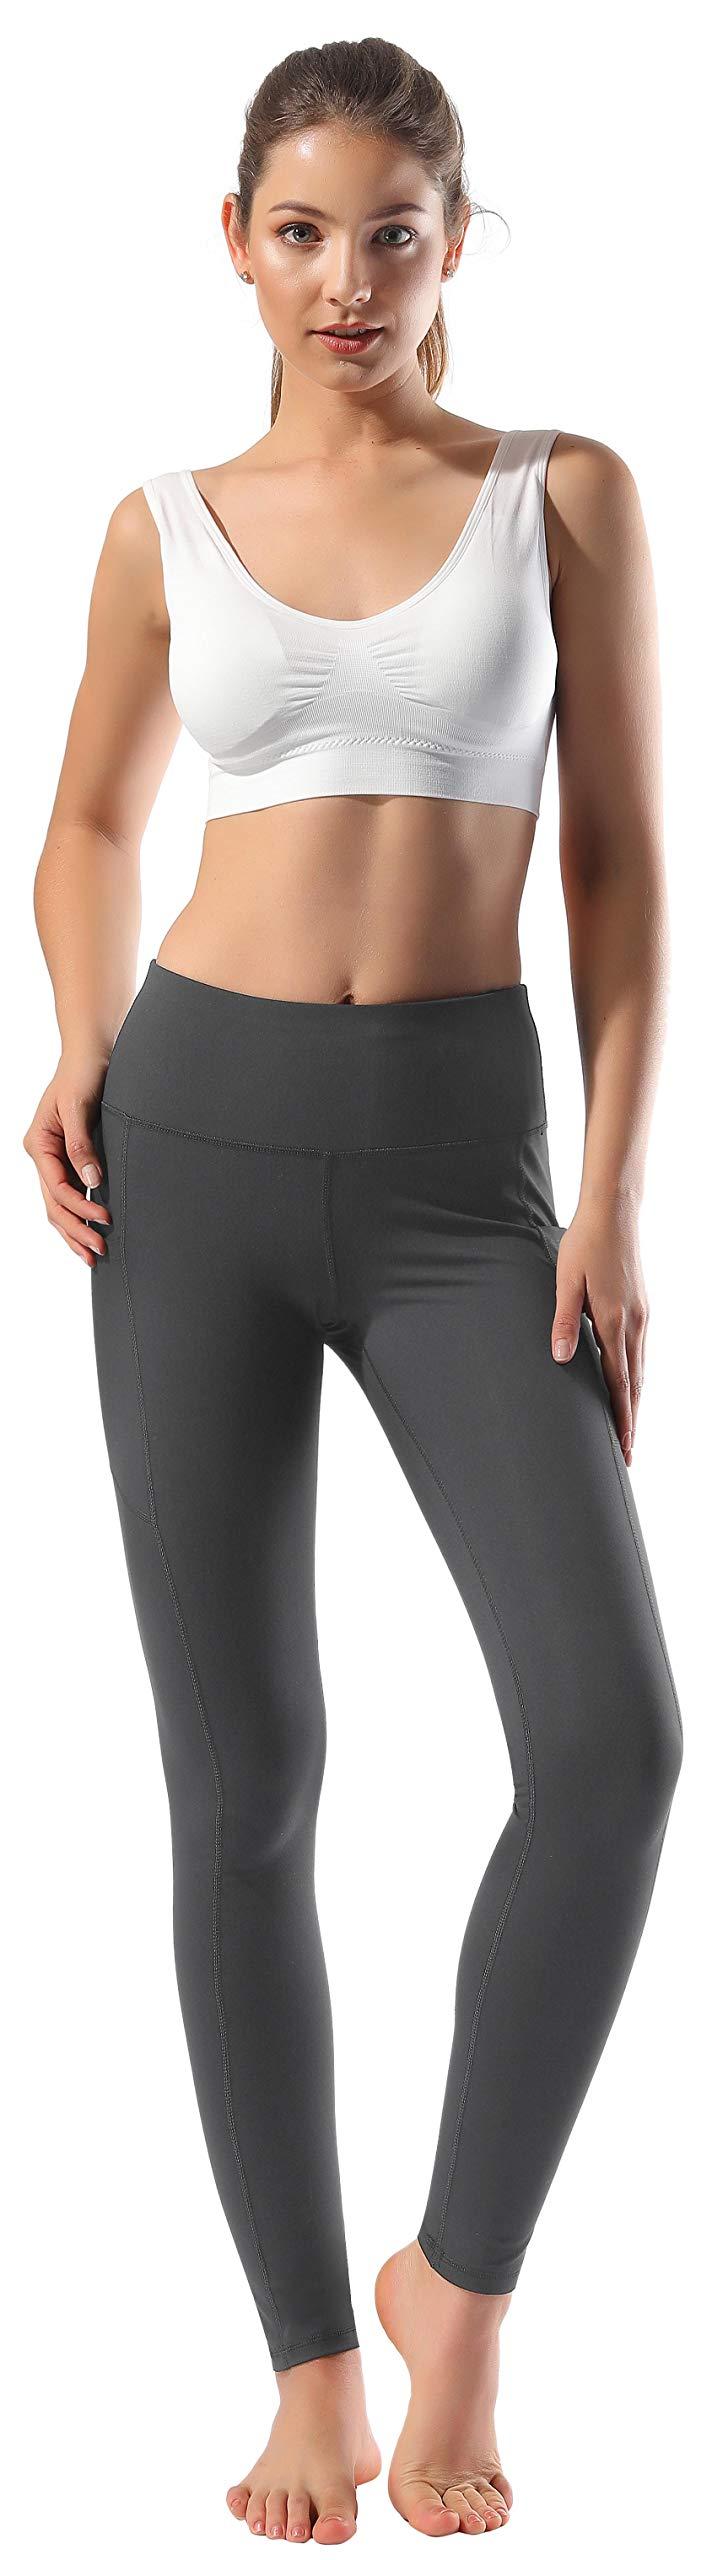 Women's High Waist Yoga Pants Side & Inner Pockets Tummy Control Workout Running 4 Way Stretch Sports Leggings by HOFI (Image #2)